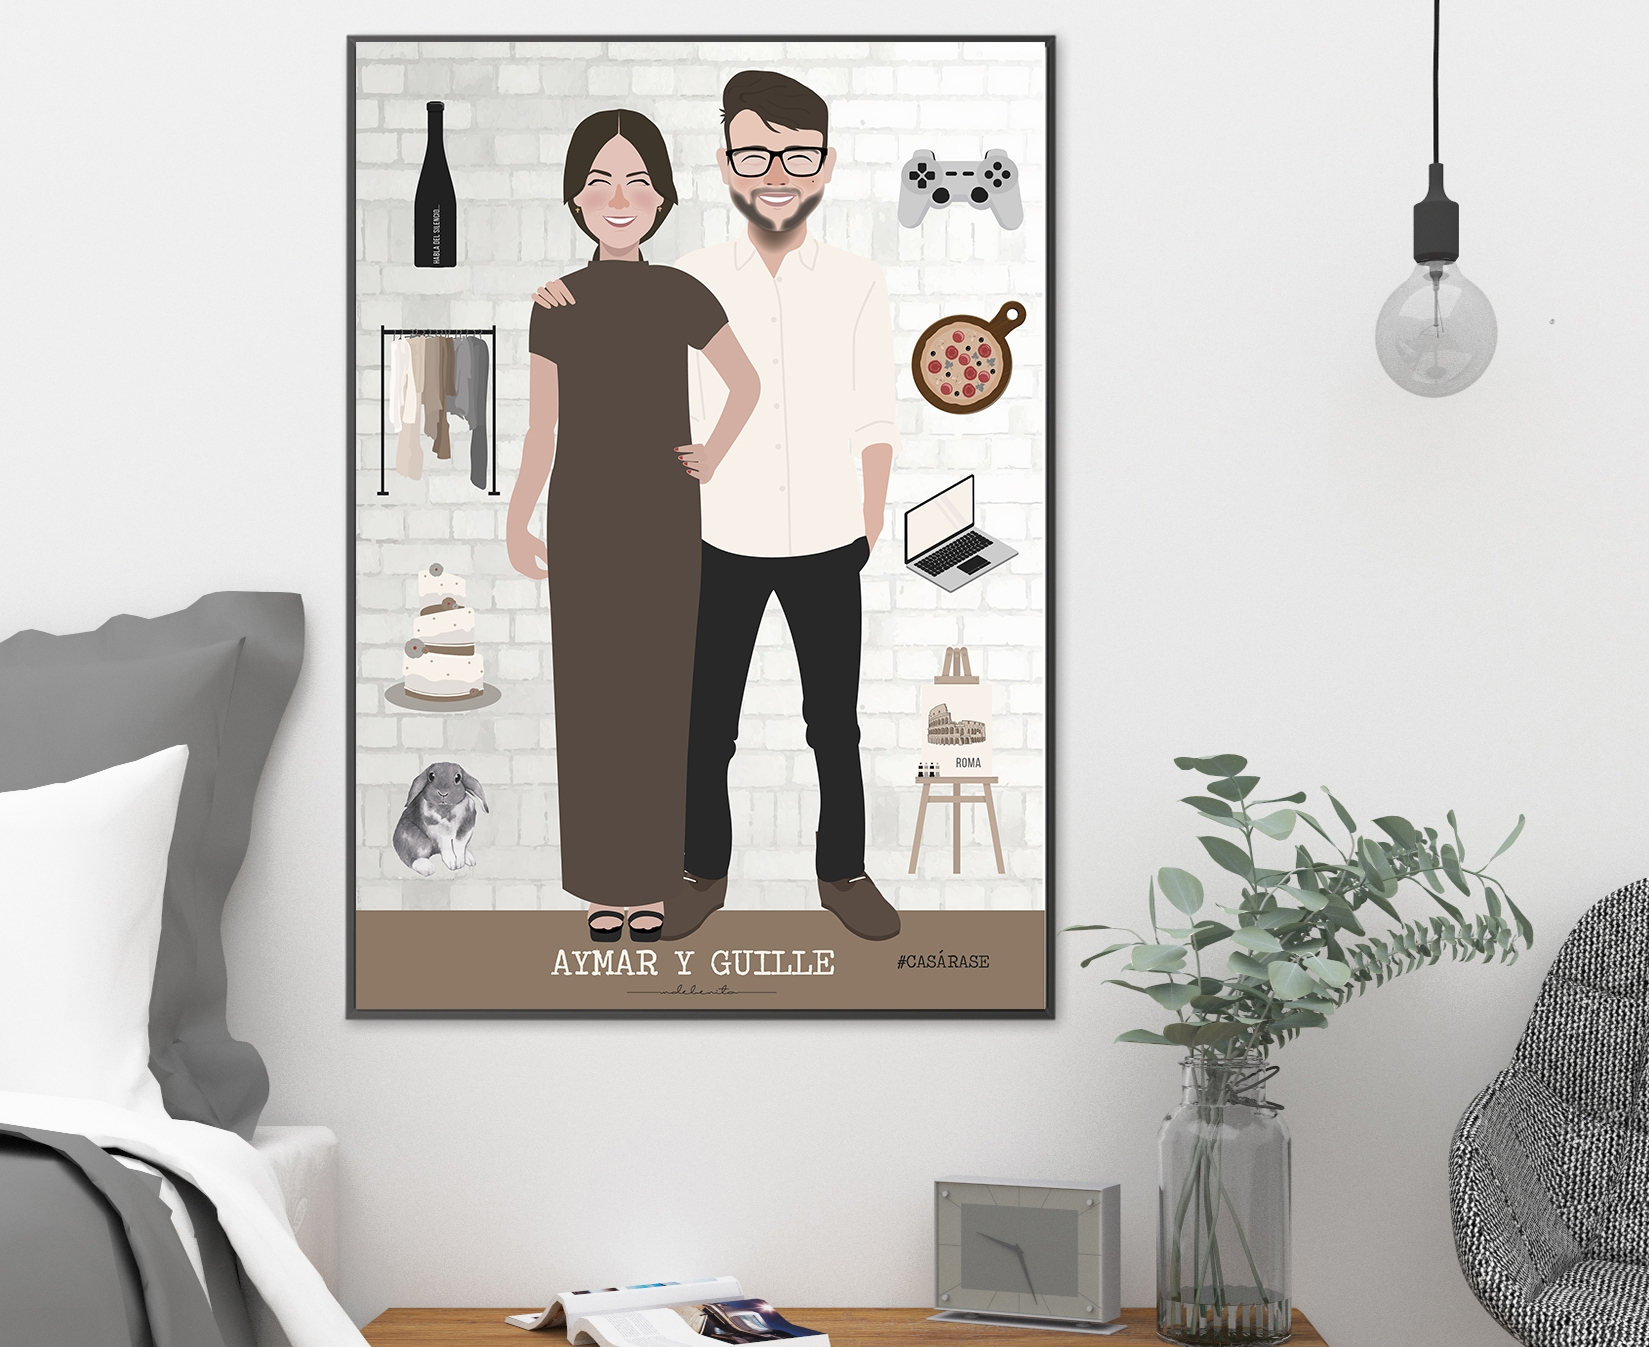 ilustracion-personalizada-mdebenito-asturias-diseño-regalo-pareja-boda-novios.jpg